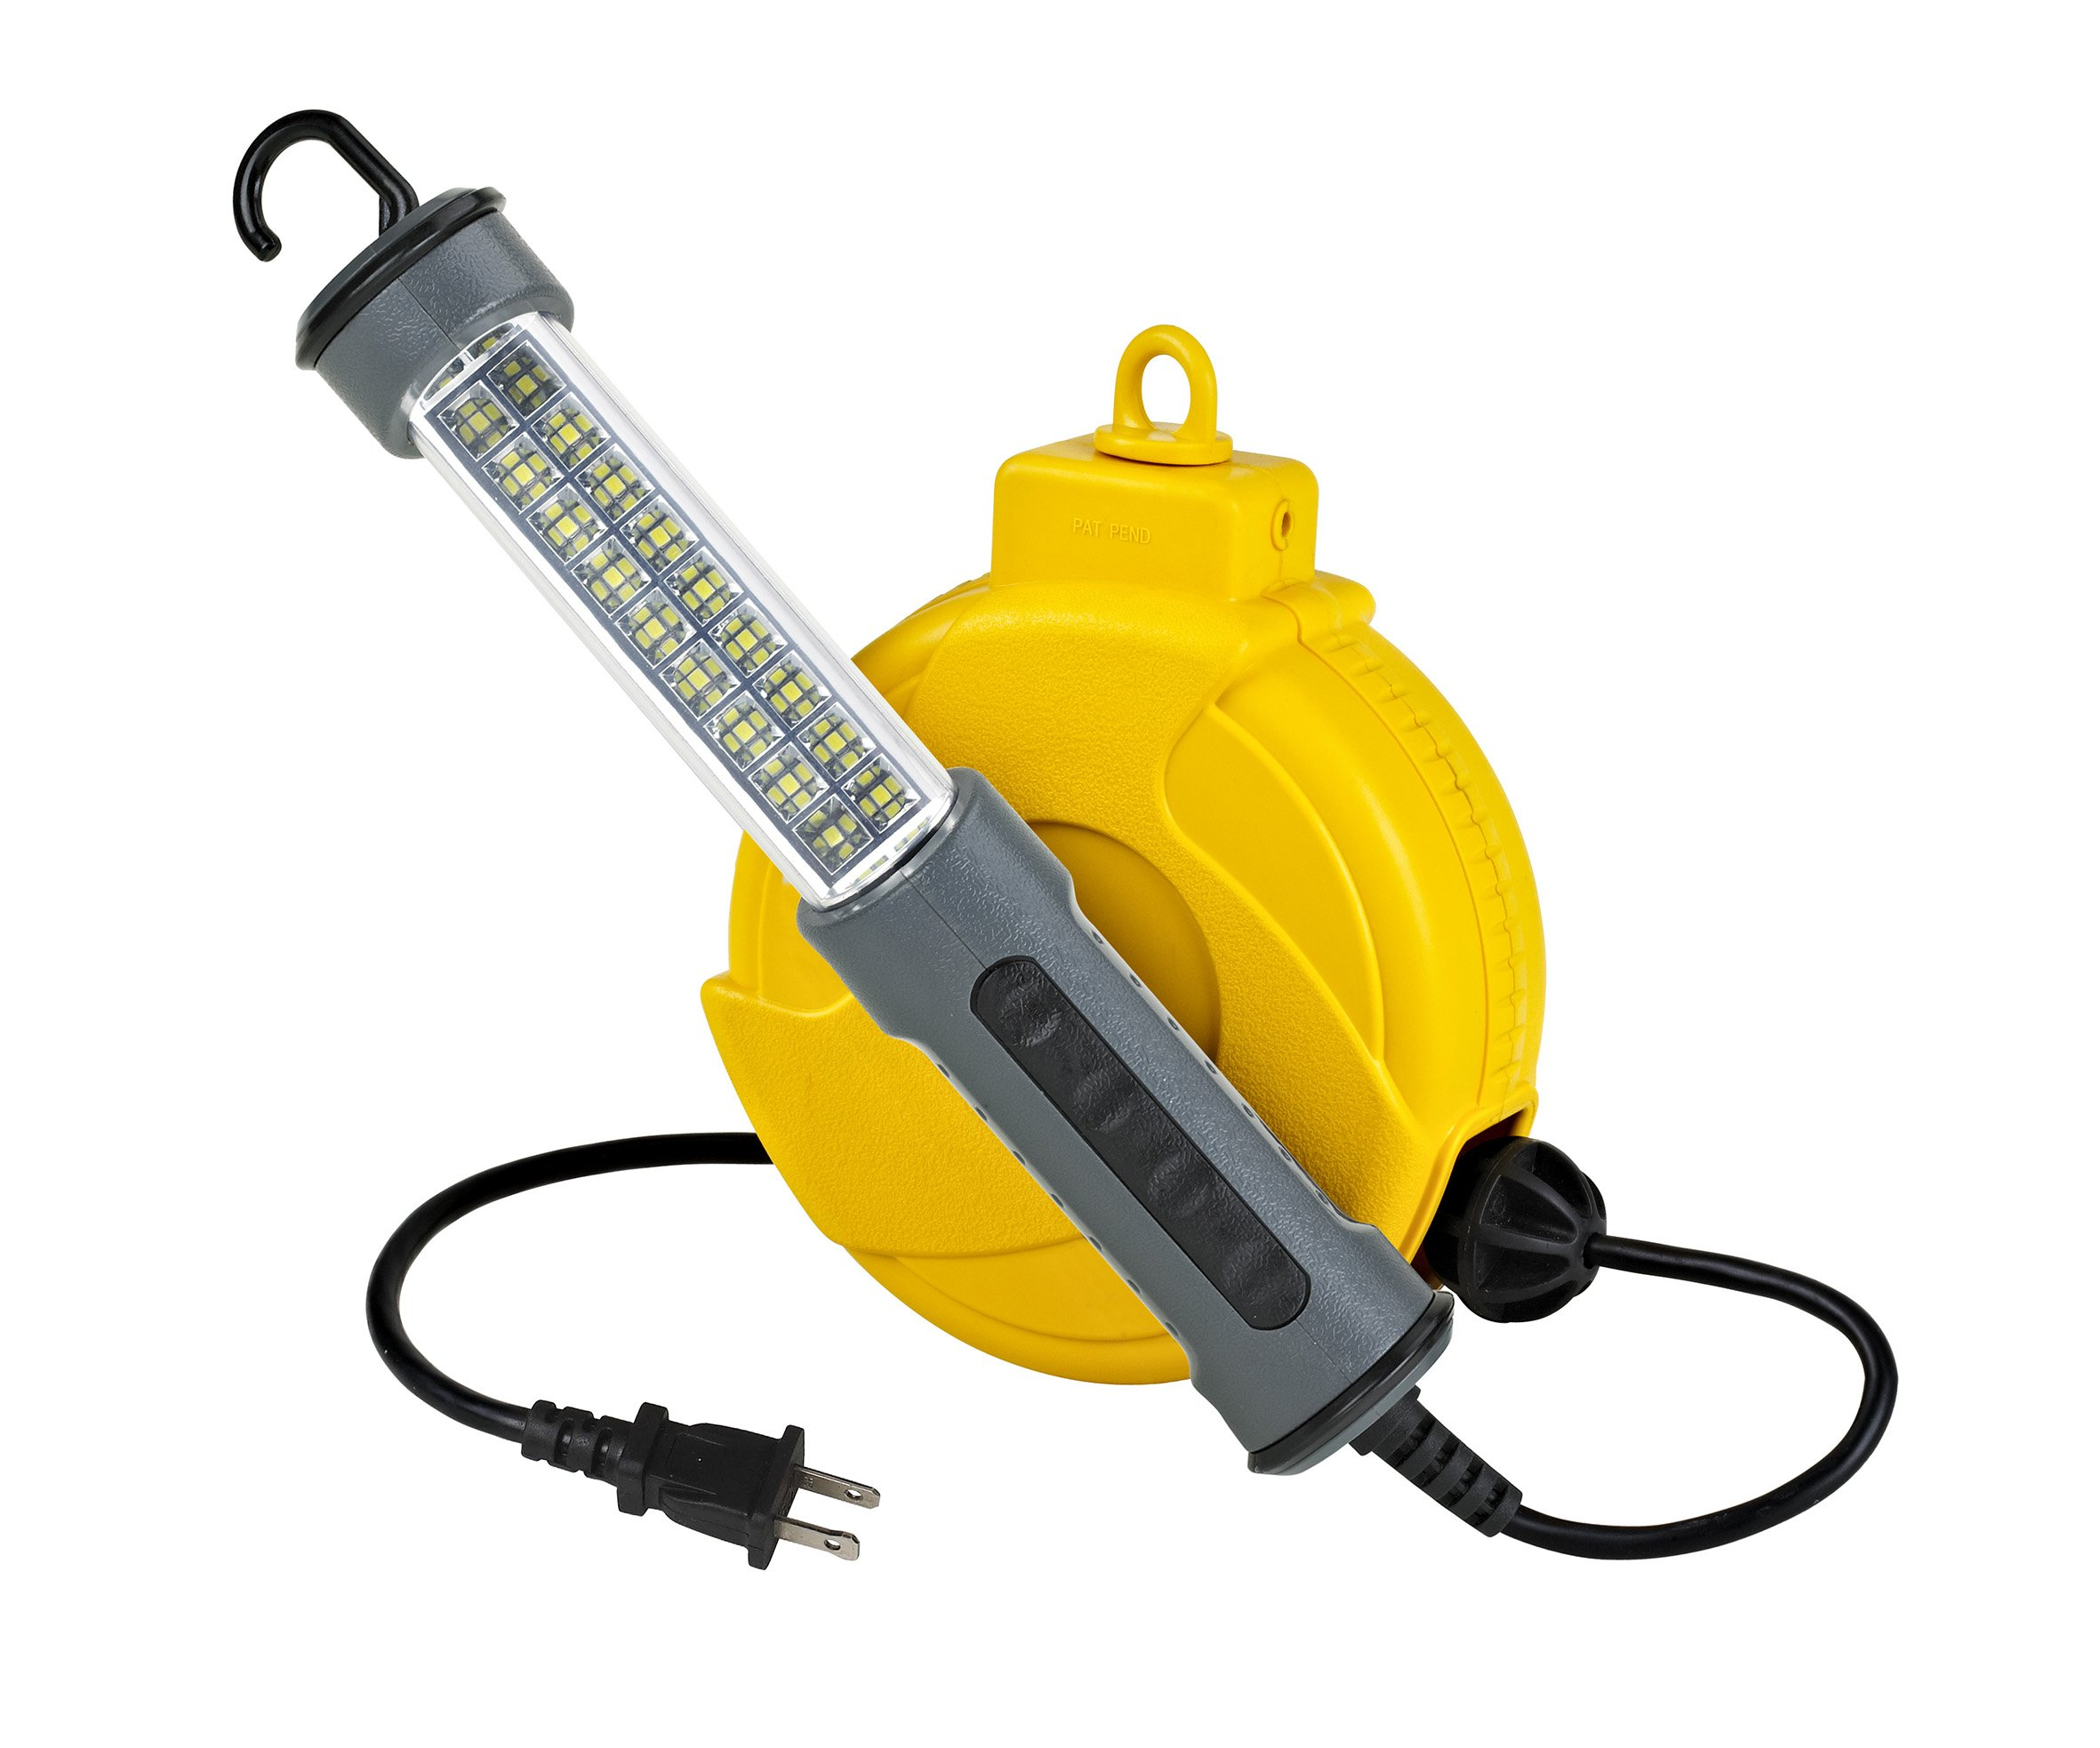 Alert Stamping 920LSM 18 SMD LED 150 lm Retractable Cord Reel